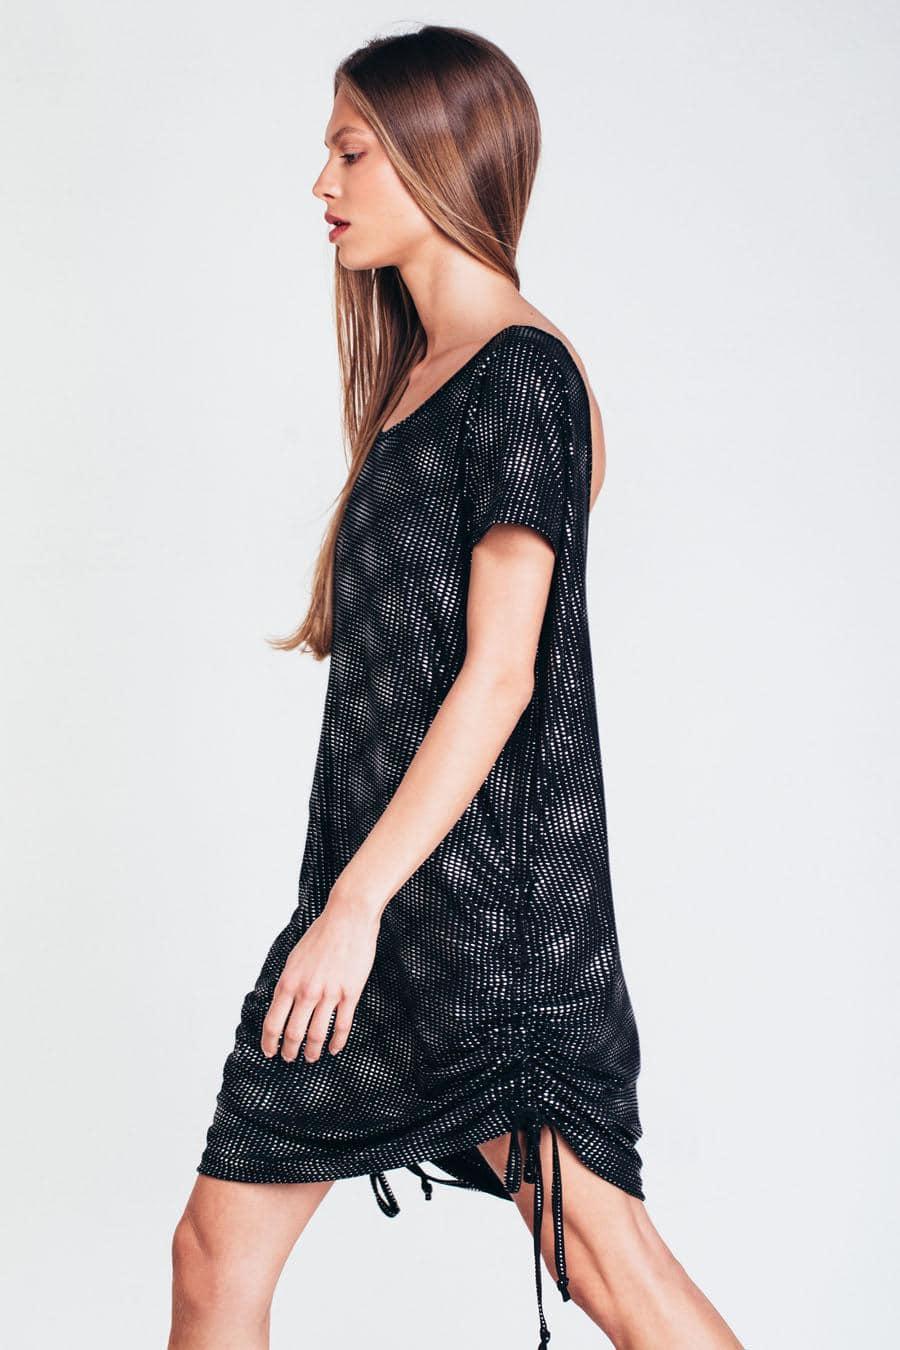 jagger zenska haljina kolekcija prolece leto 2021 ss 2021 kupi online jg 8456 01 3